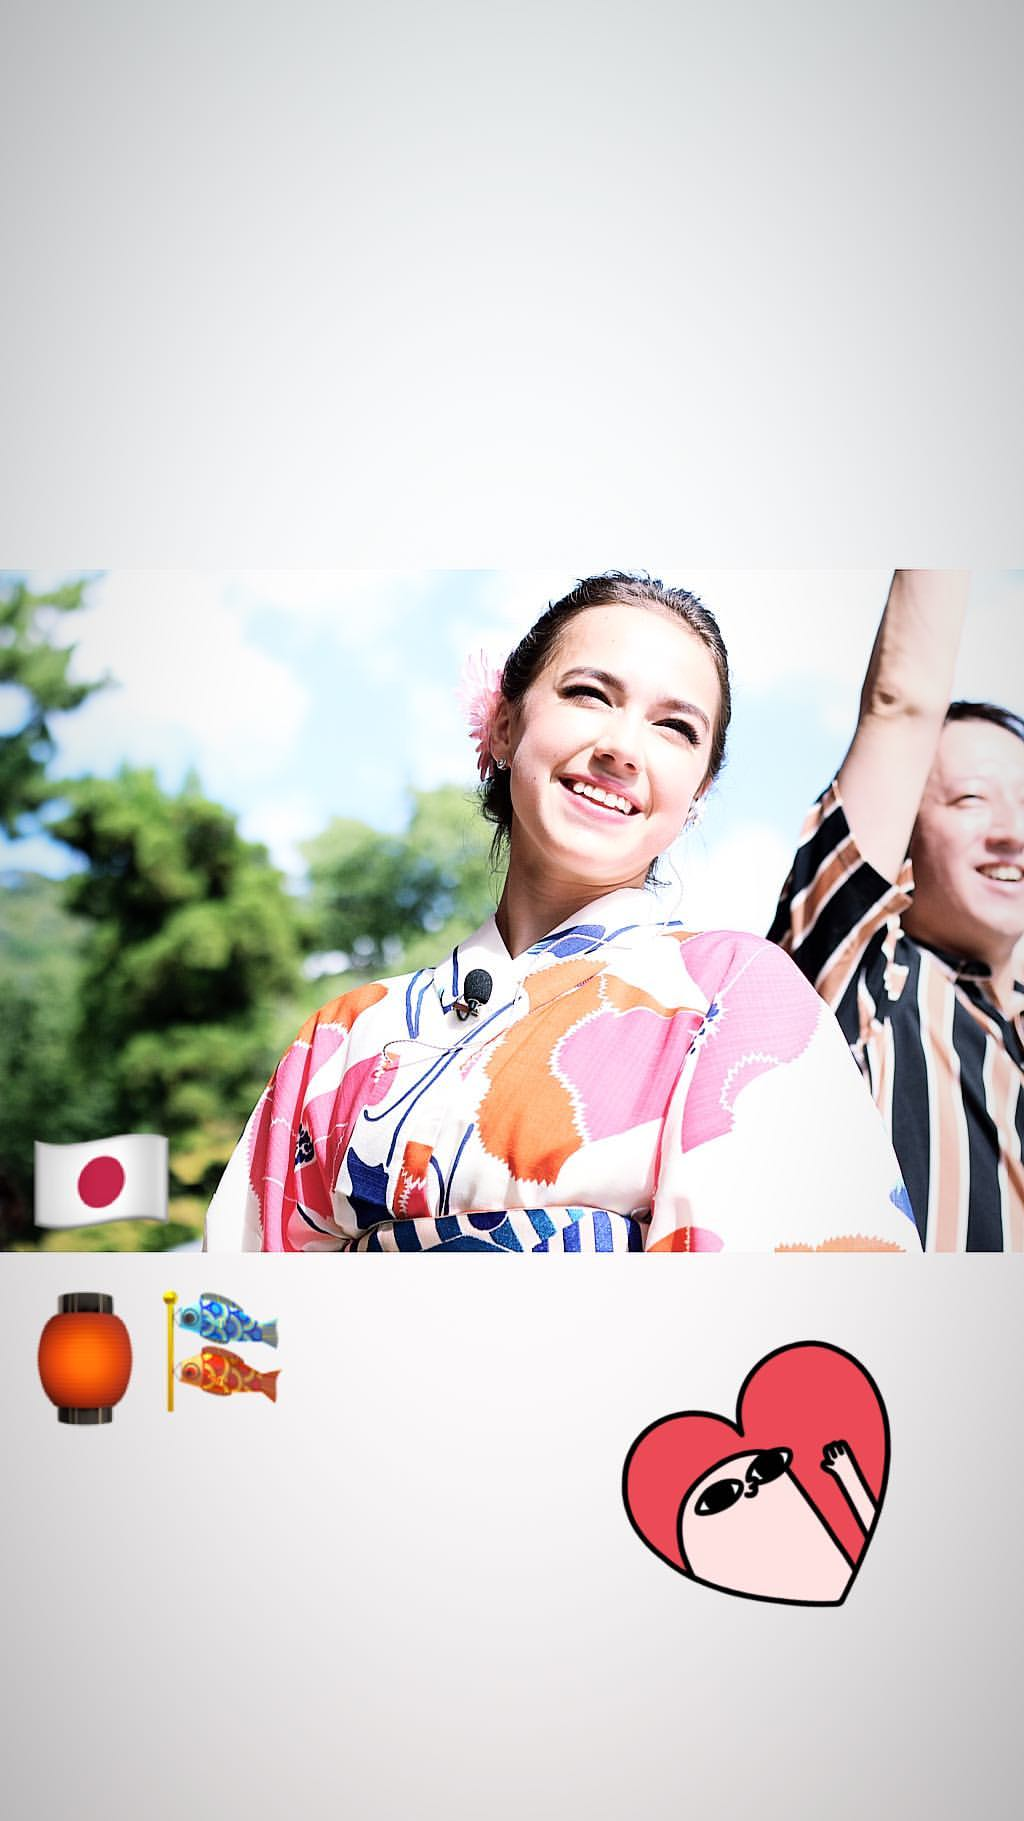 THE ICEで来日した海外メンバーが日本観光! 投稿画像、動画まとめ